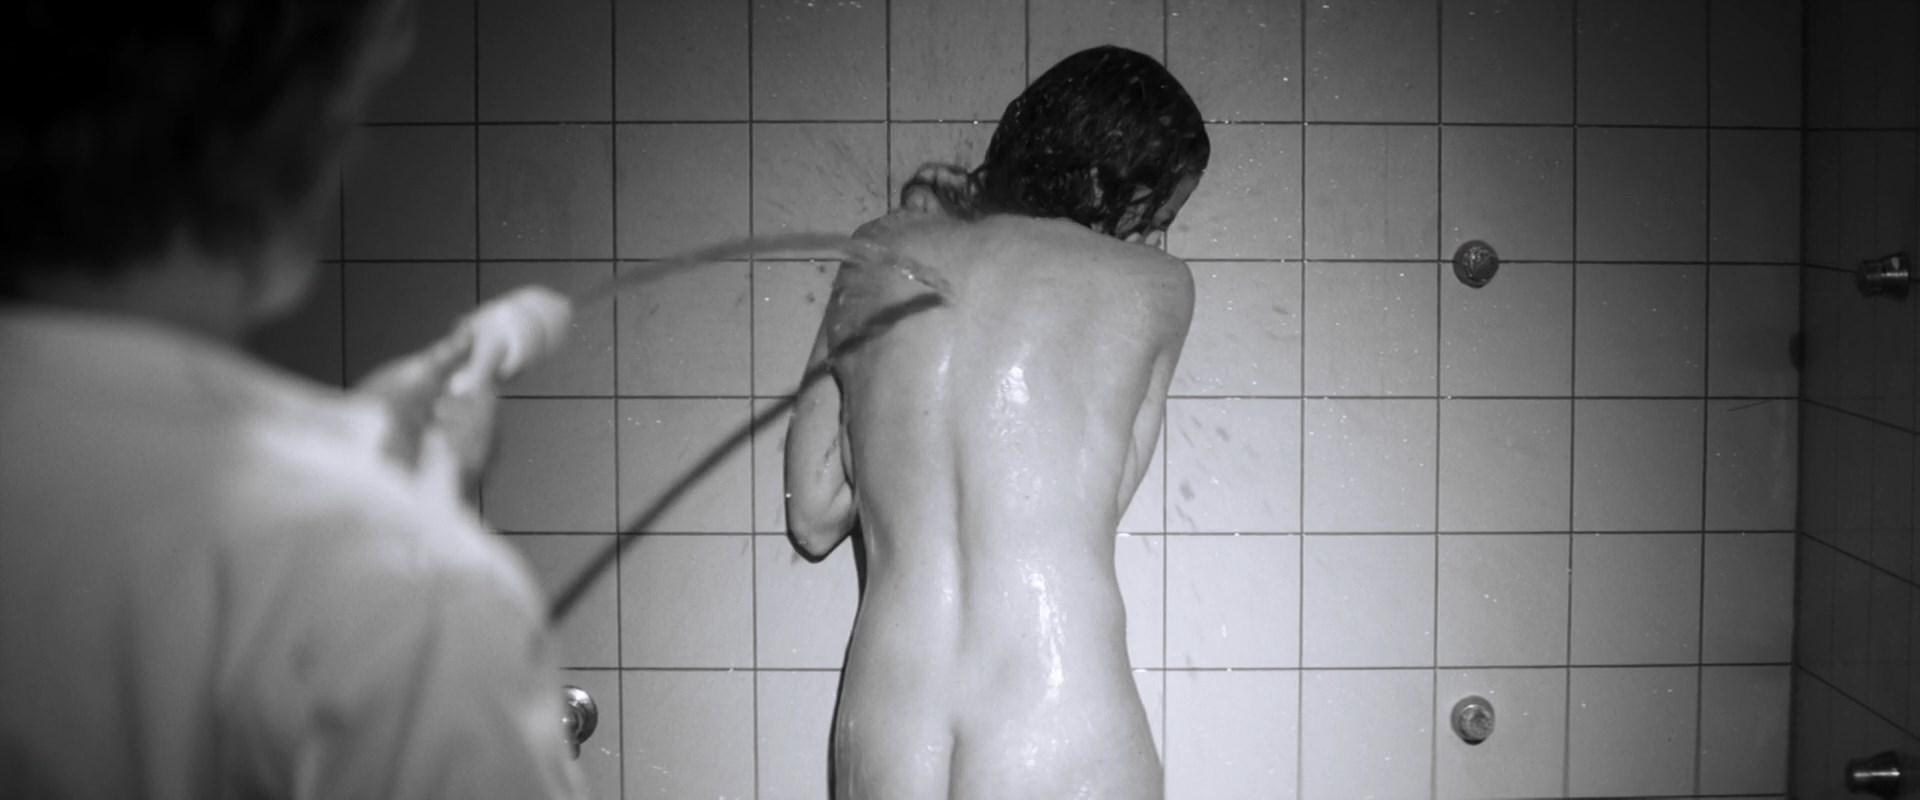 marie baumer nude